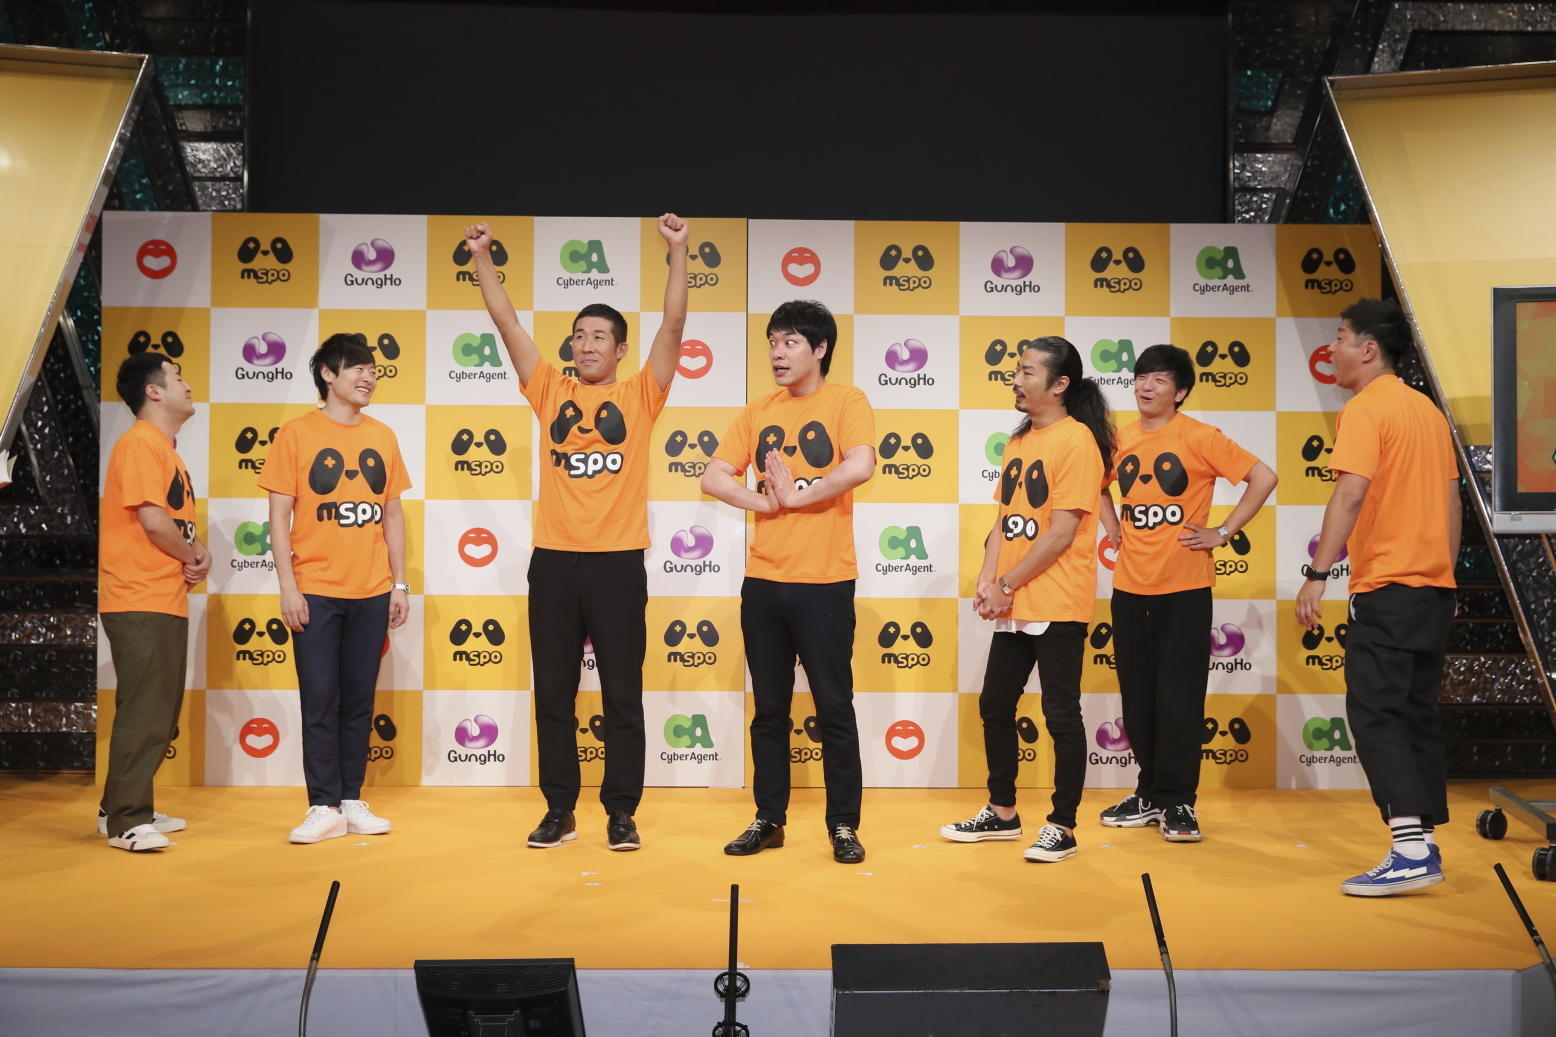 http://news.yoshimoto.co.jp/20180928162858-5e0453b12d25801e02e70e31fa8b70651df8ad5a.jpg